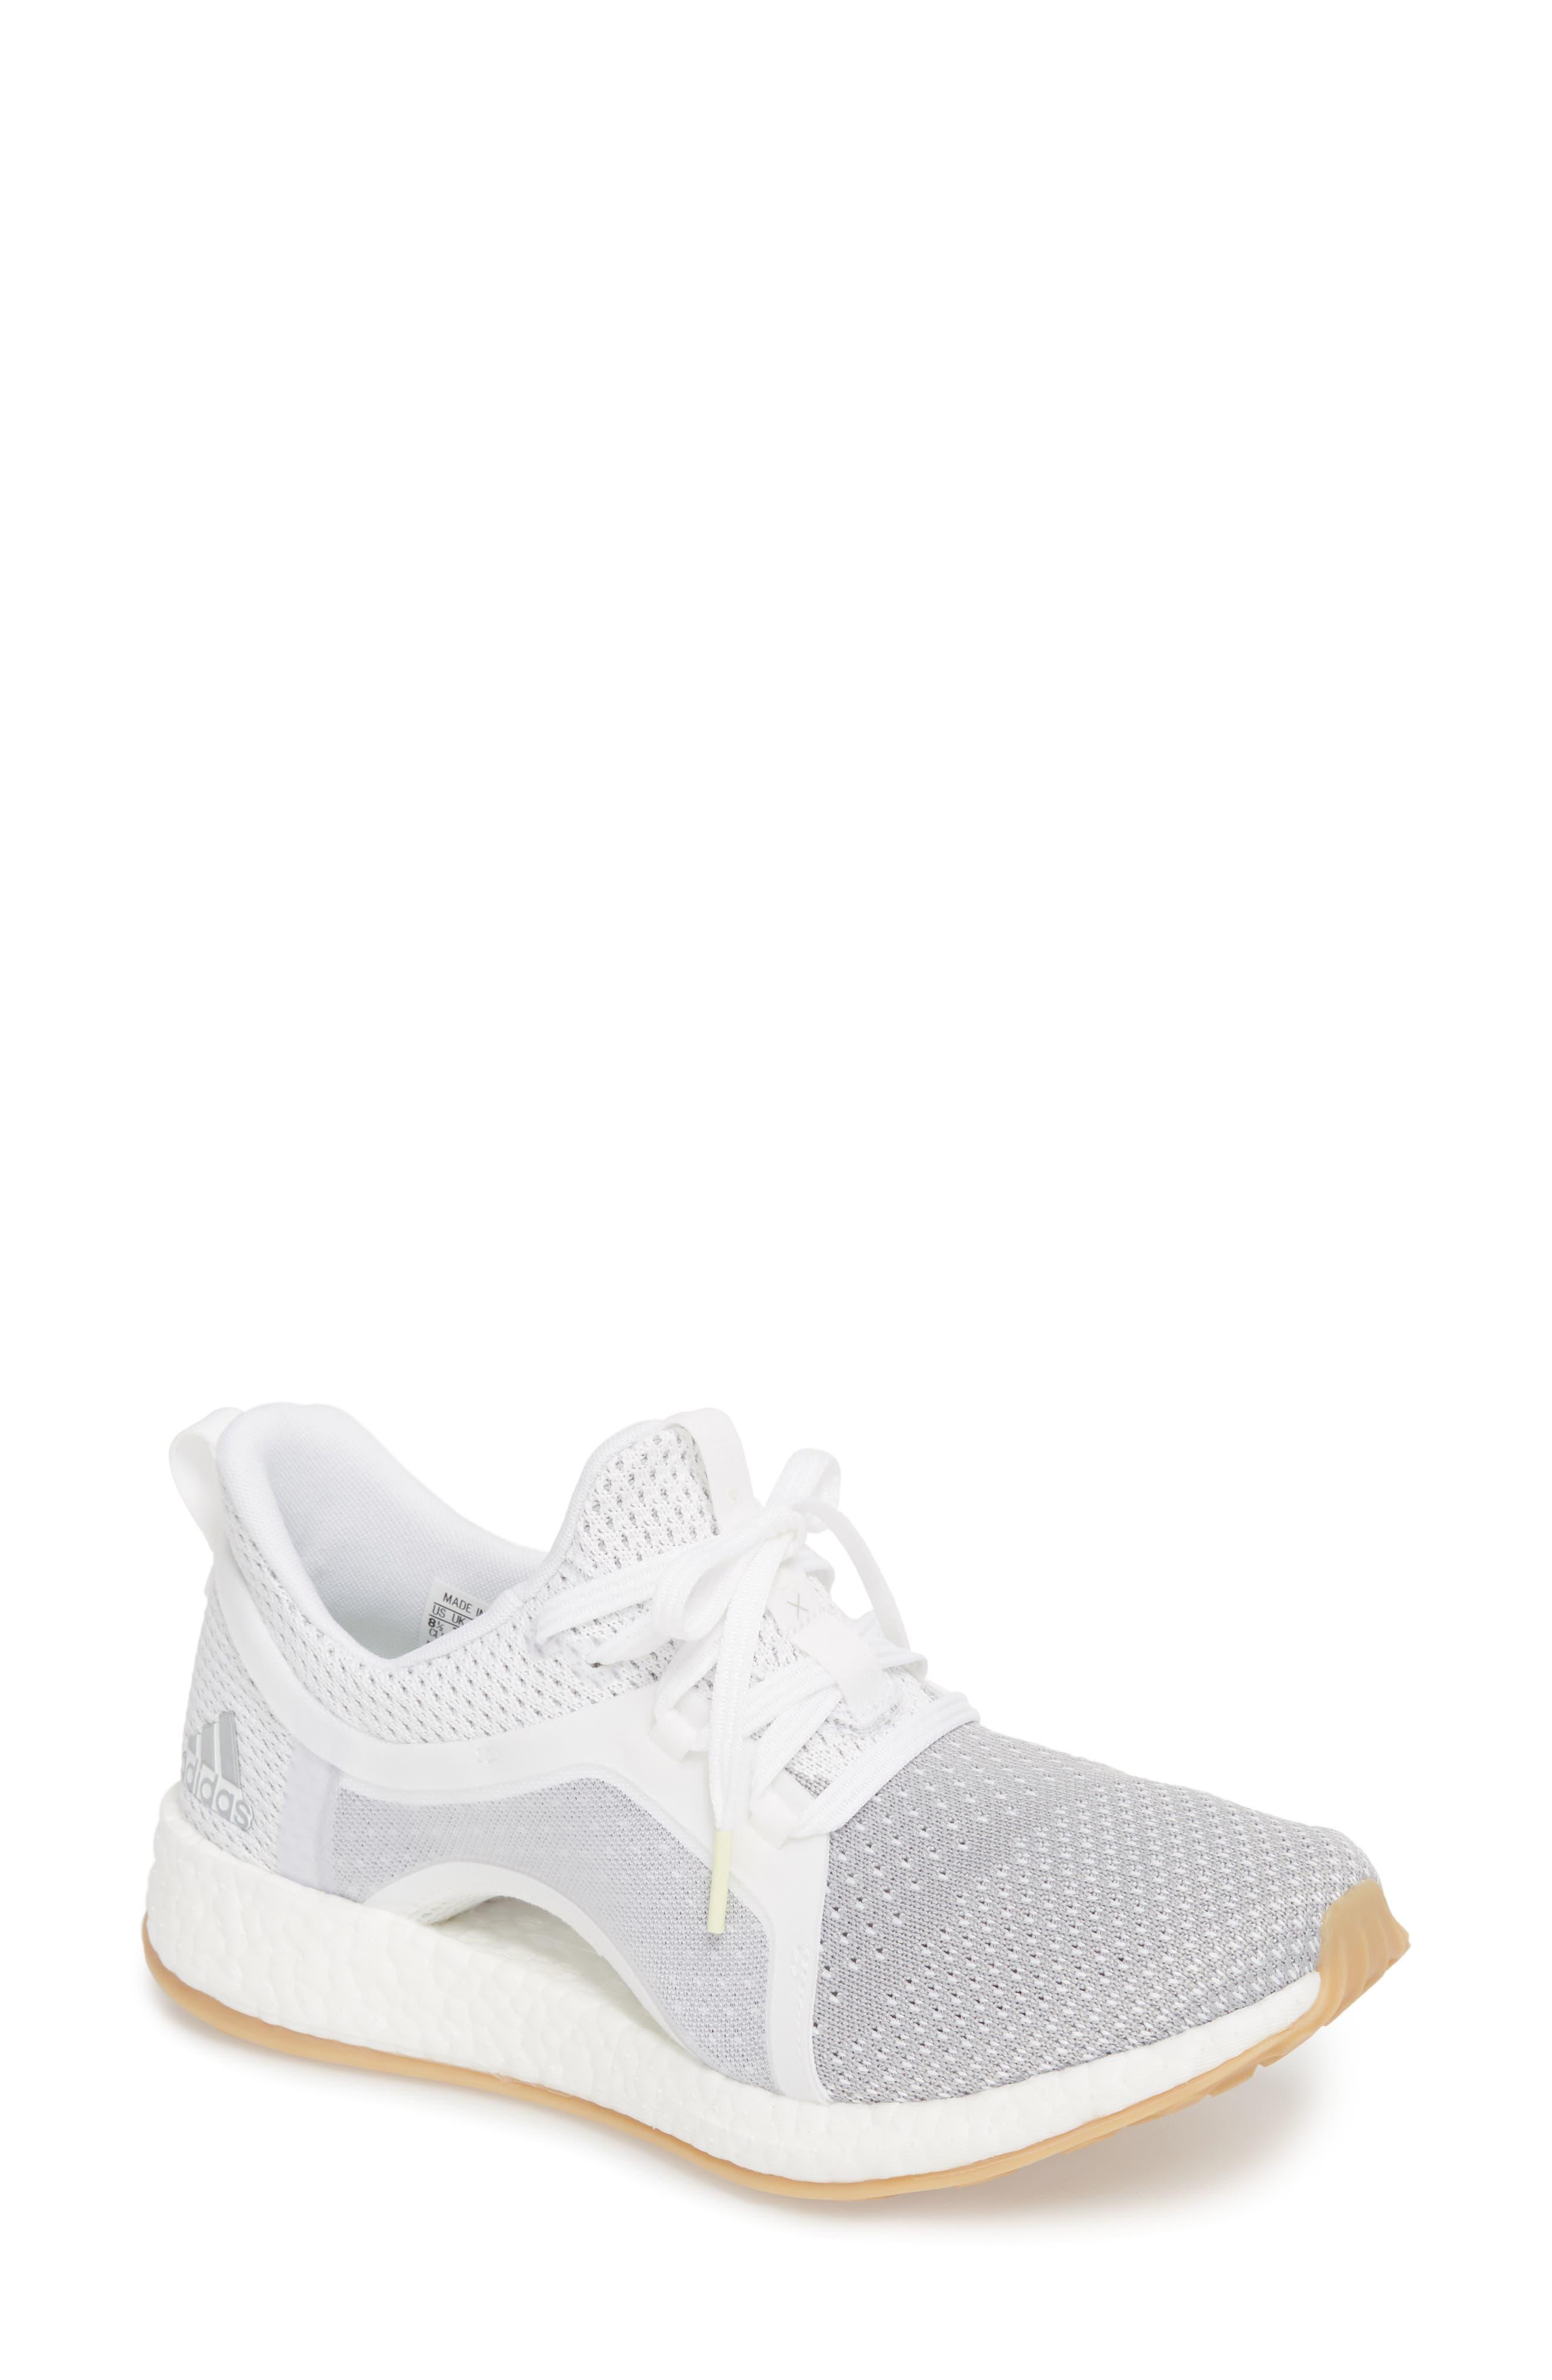 Pureboost X Clima Sneaker,                             Main thumbnail 1, color,                             White/ Silver/ Grey